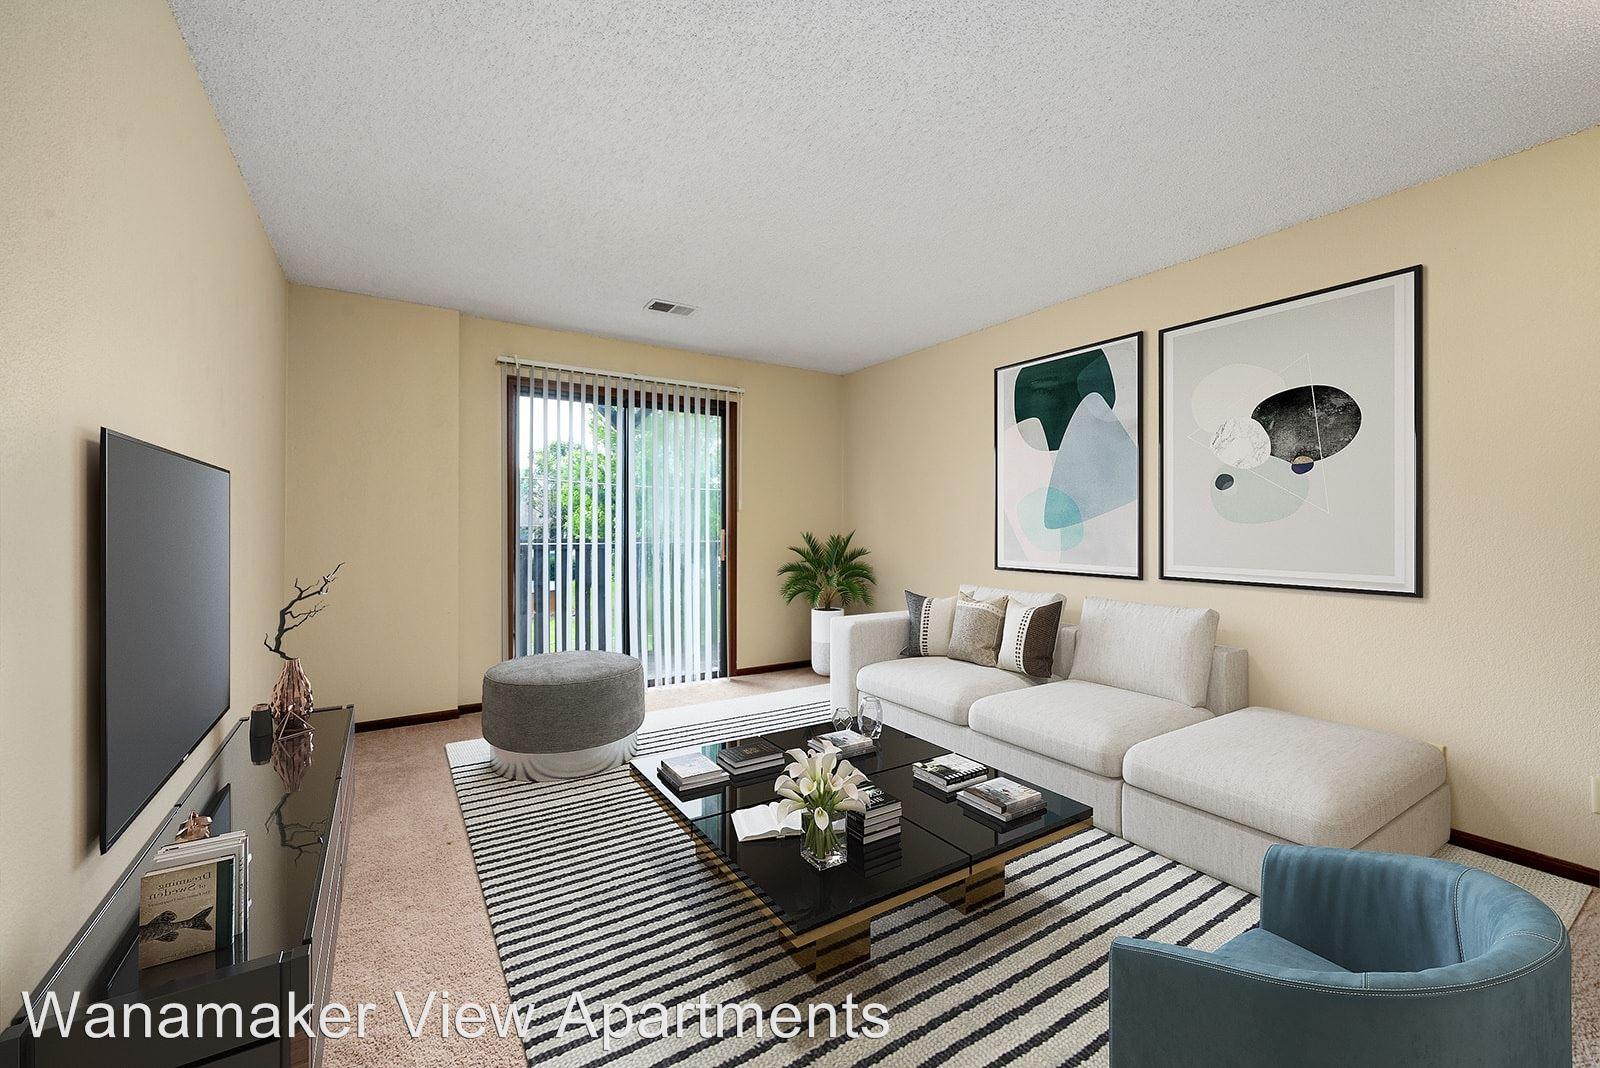 5991 SW 22nd Park, Topeka, KS - $775